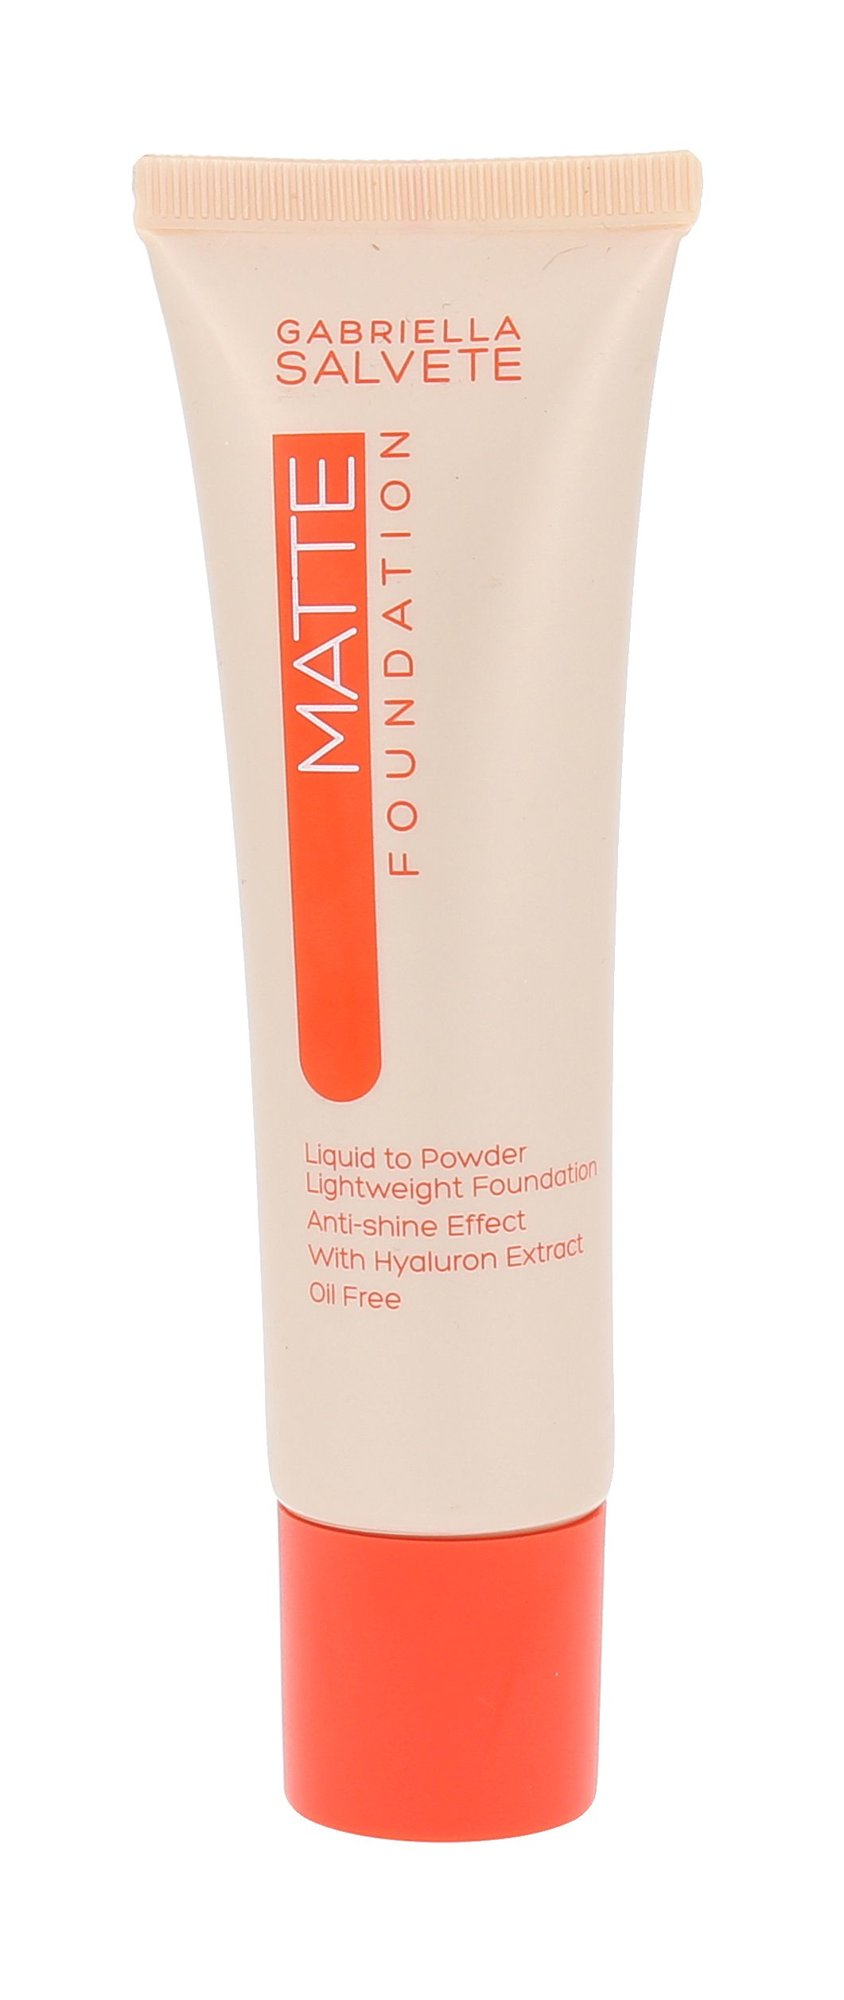 Gabriella Salvete Matte Foundation Cosmetic 30ml 104 Light Sand